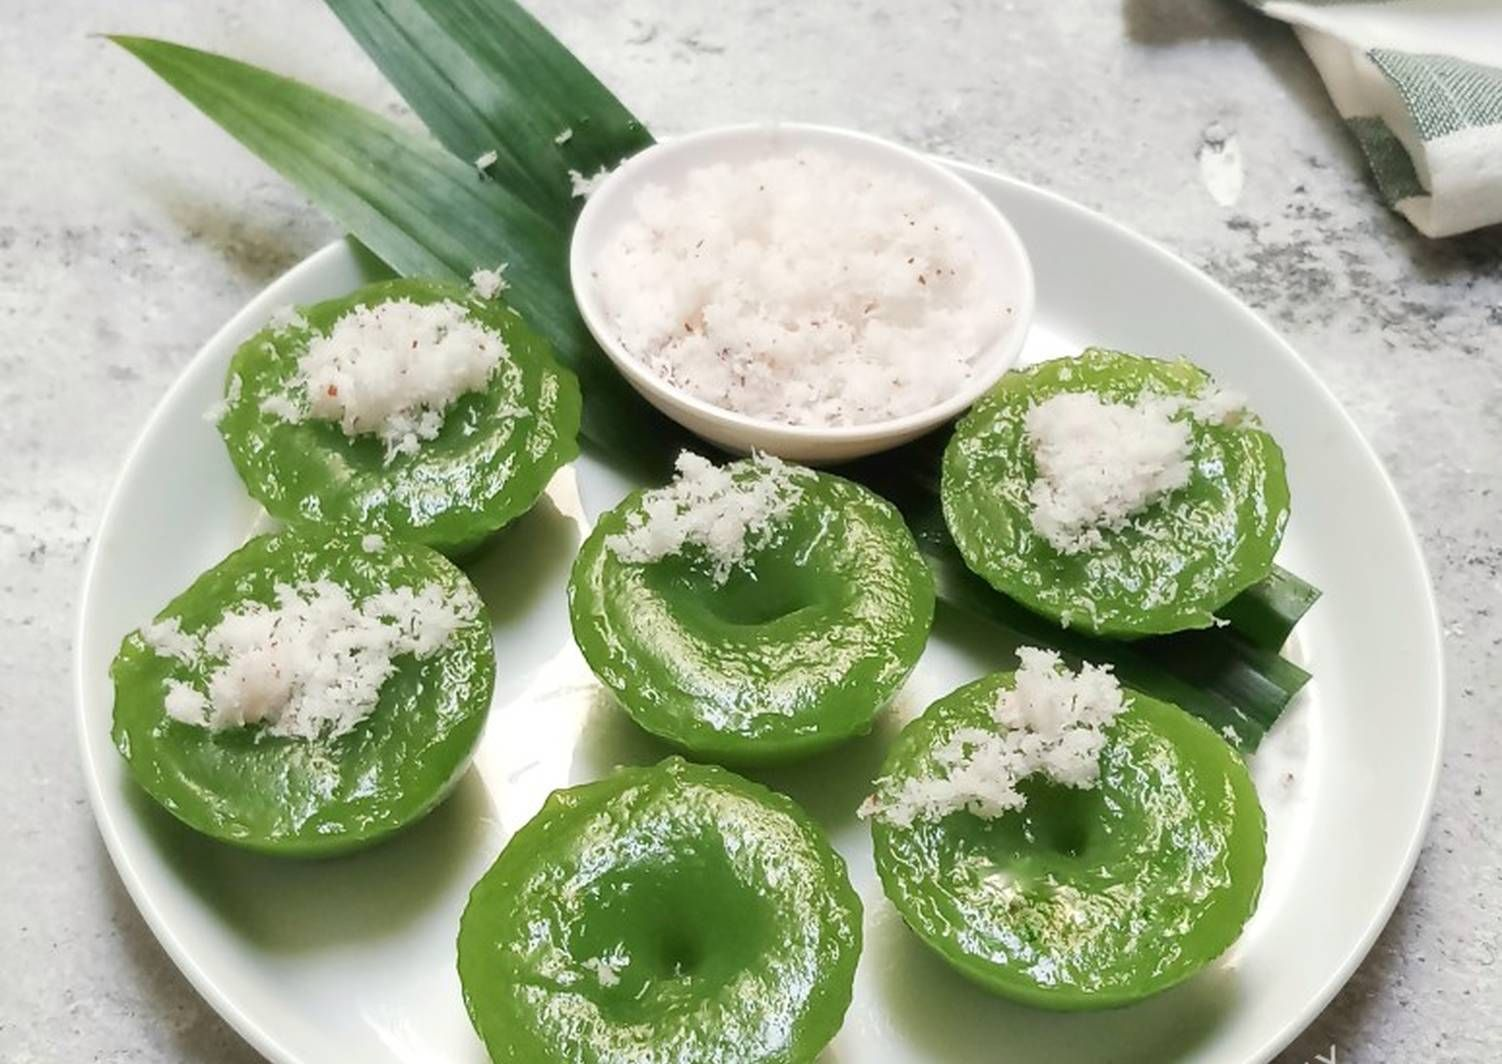 Resep Kue Lumpang Kue Ijo Oleh Dapurvy Resep Makanan Resep Masakan Resep